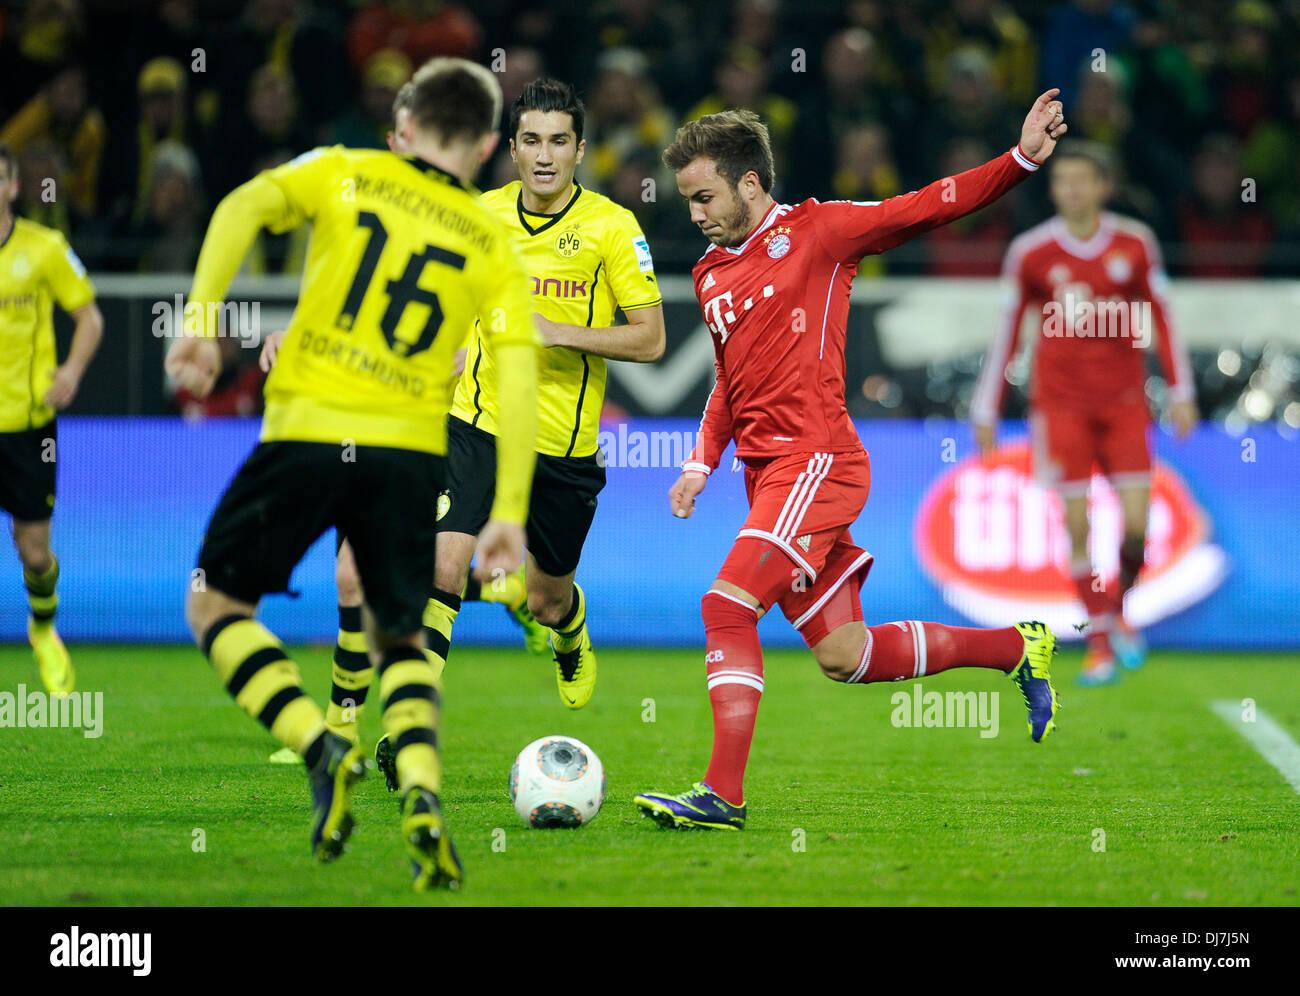 Dortmund, Germany November 23rd 2013, German Football Bundesliga Season 2013/14 matchday 13, Borussia Dortmund (BVB) vs. FC Bayern Munich (Muenchen, Munchen, FCB) 3:0 --- Mario Gštze (Goetze) (Bayern) shoots his goal for the 0:1 - Stock Image